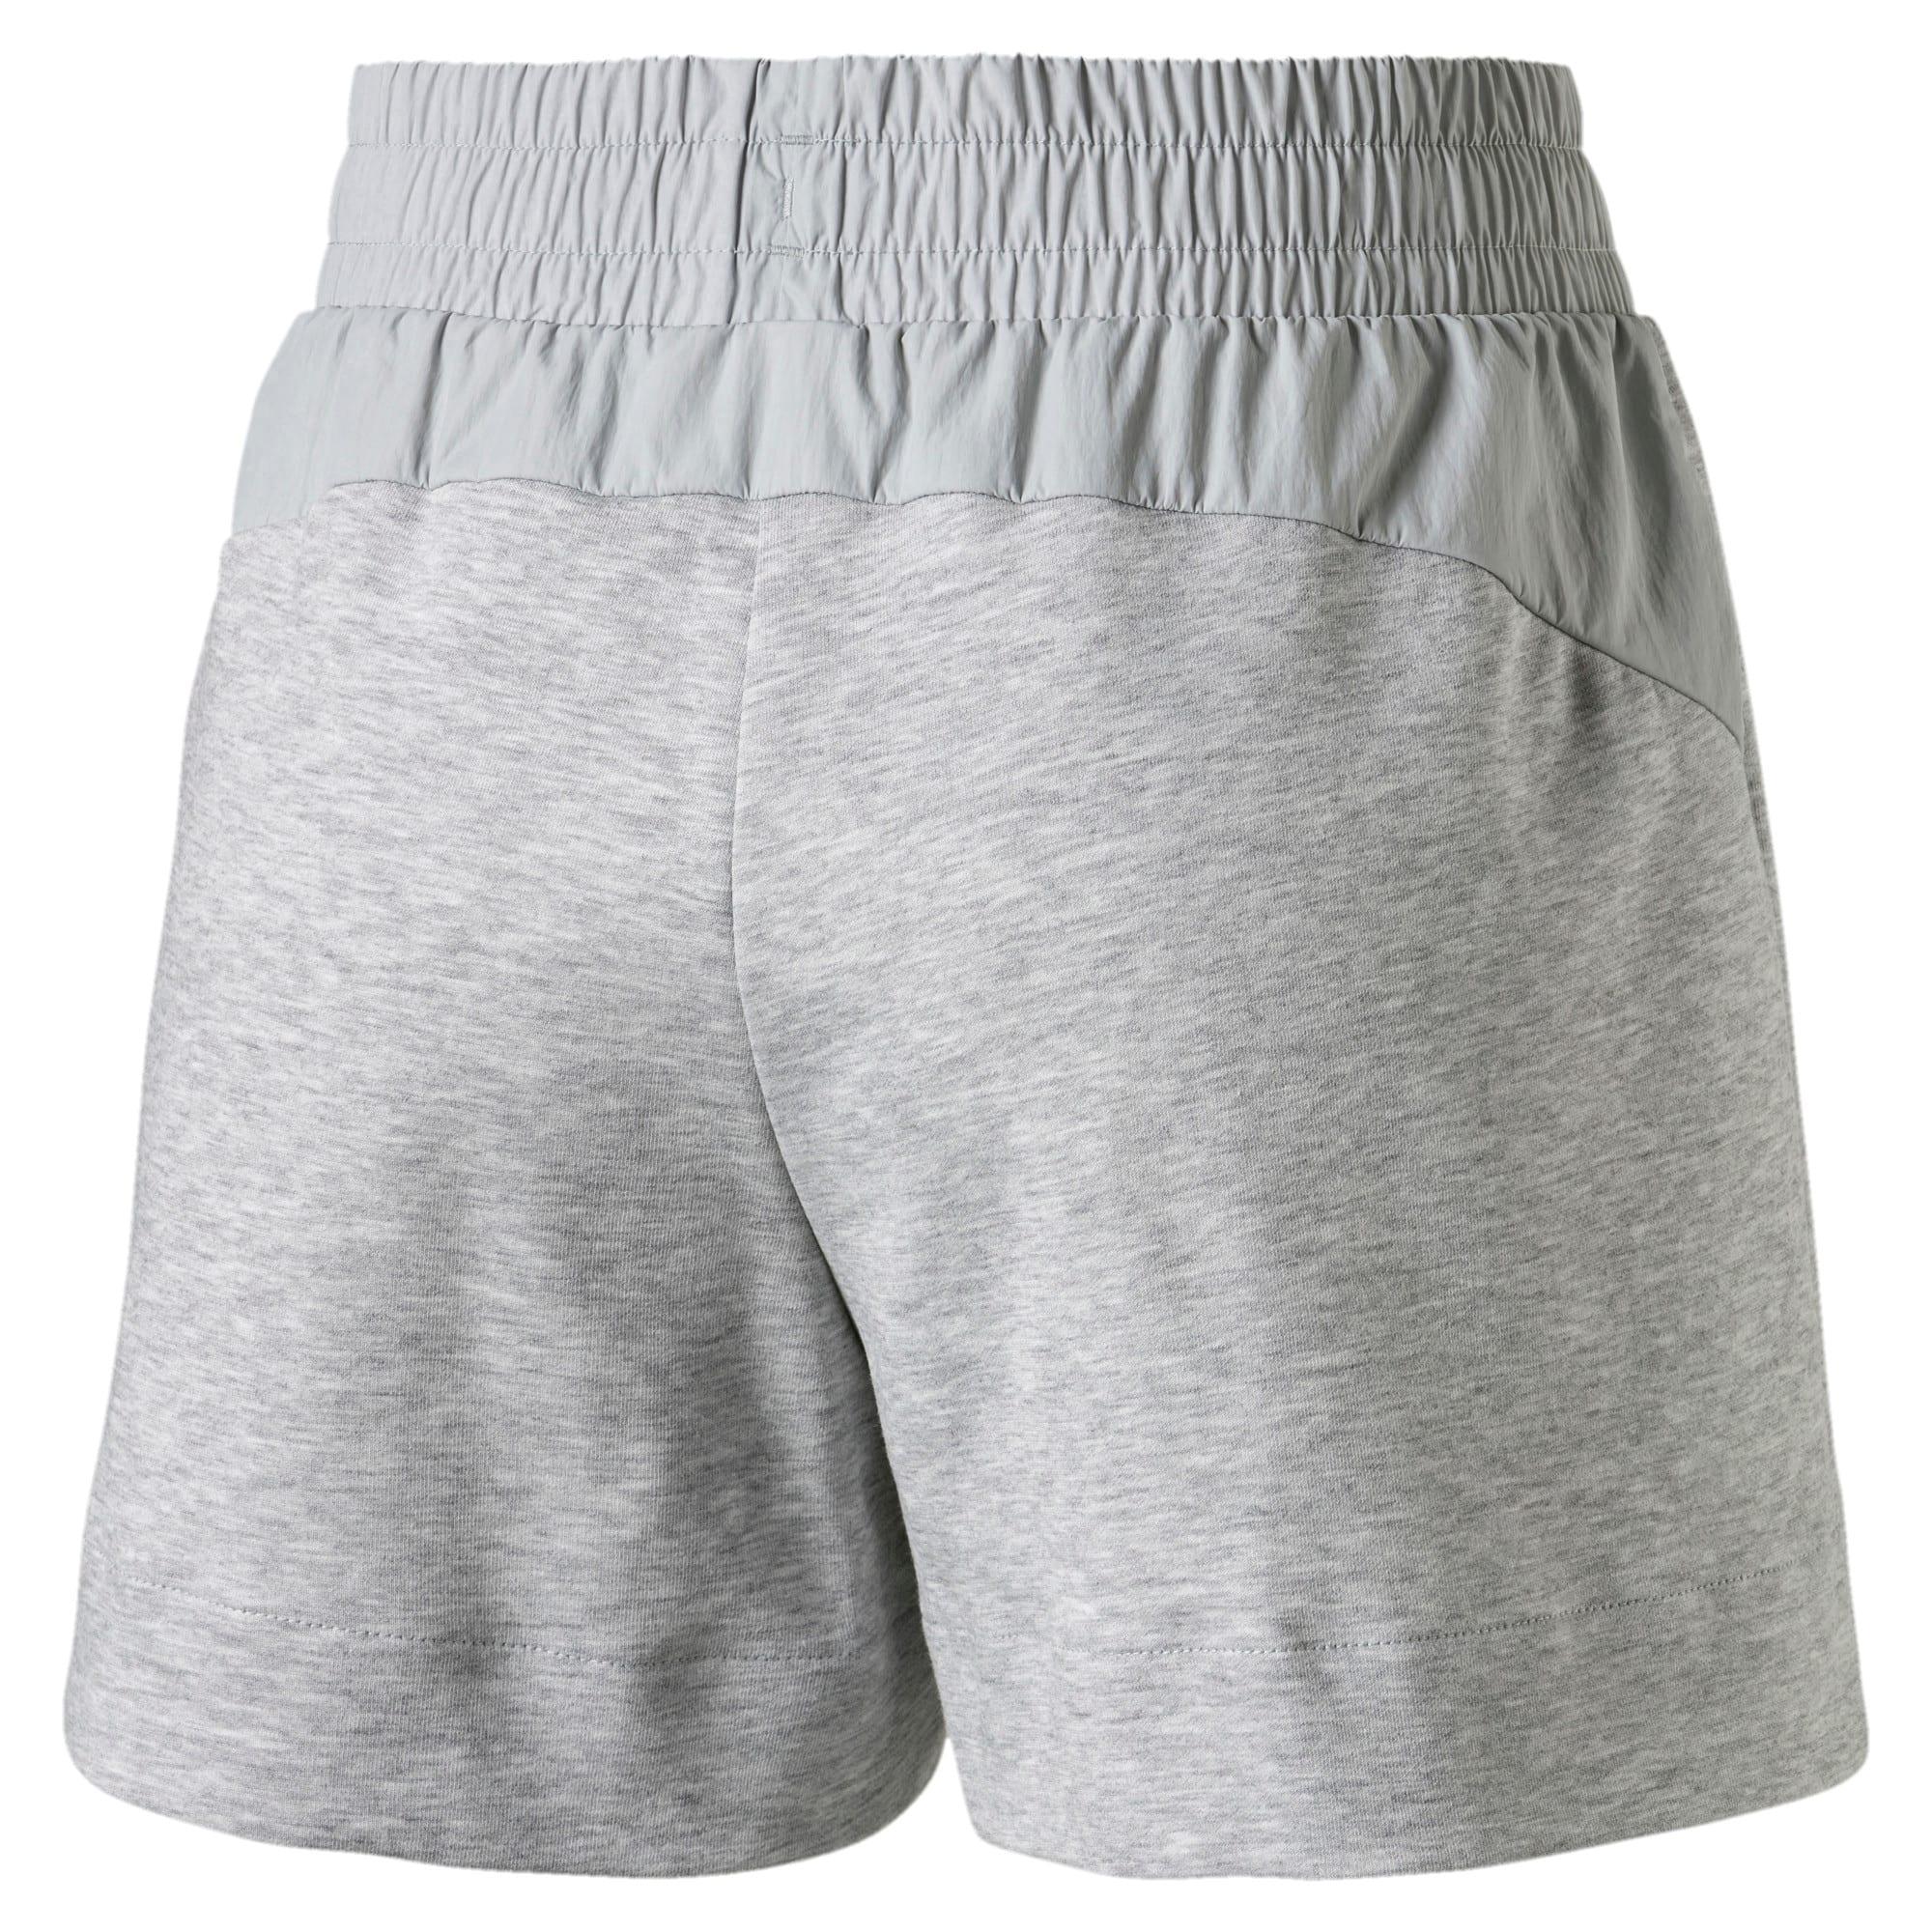 Thumbnail 5 of Evostripe Lite Women's Shorts, Light Gray Heather, medium